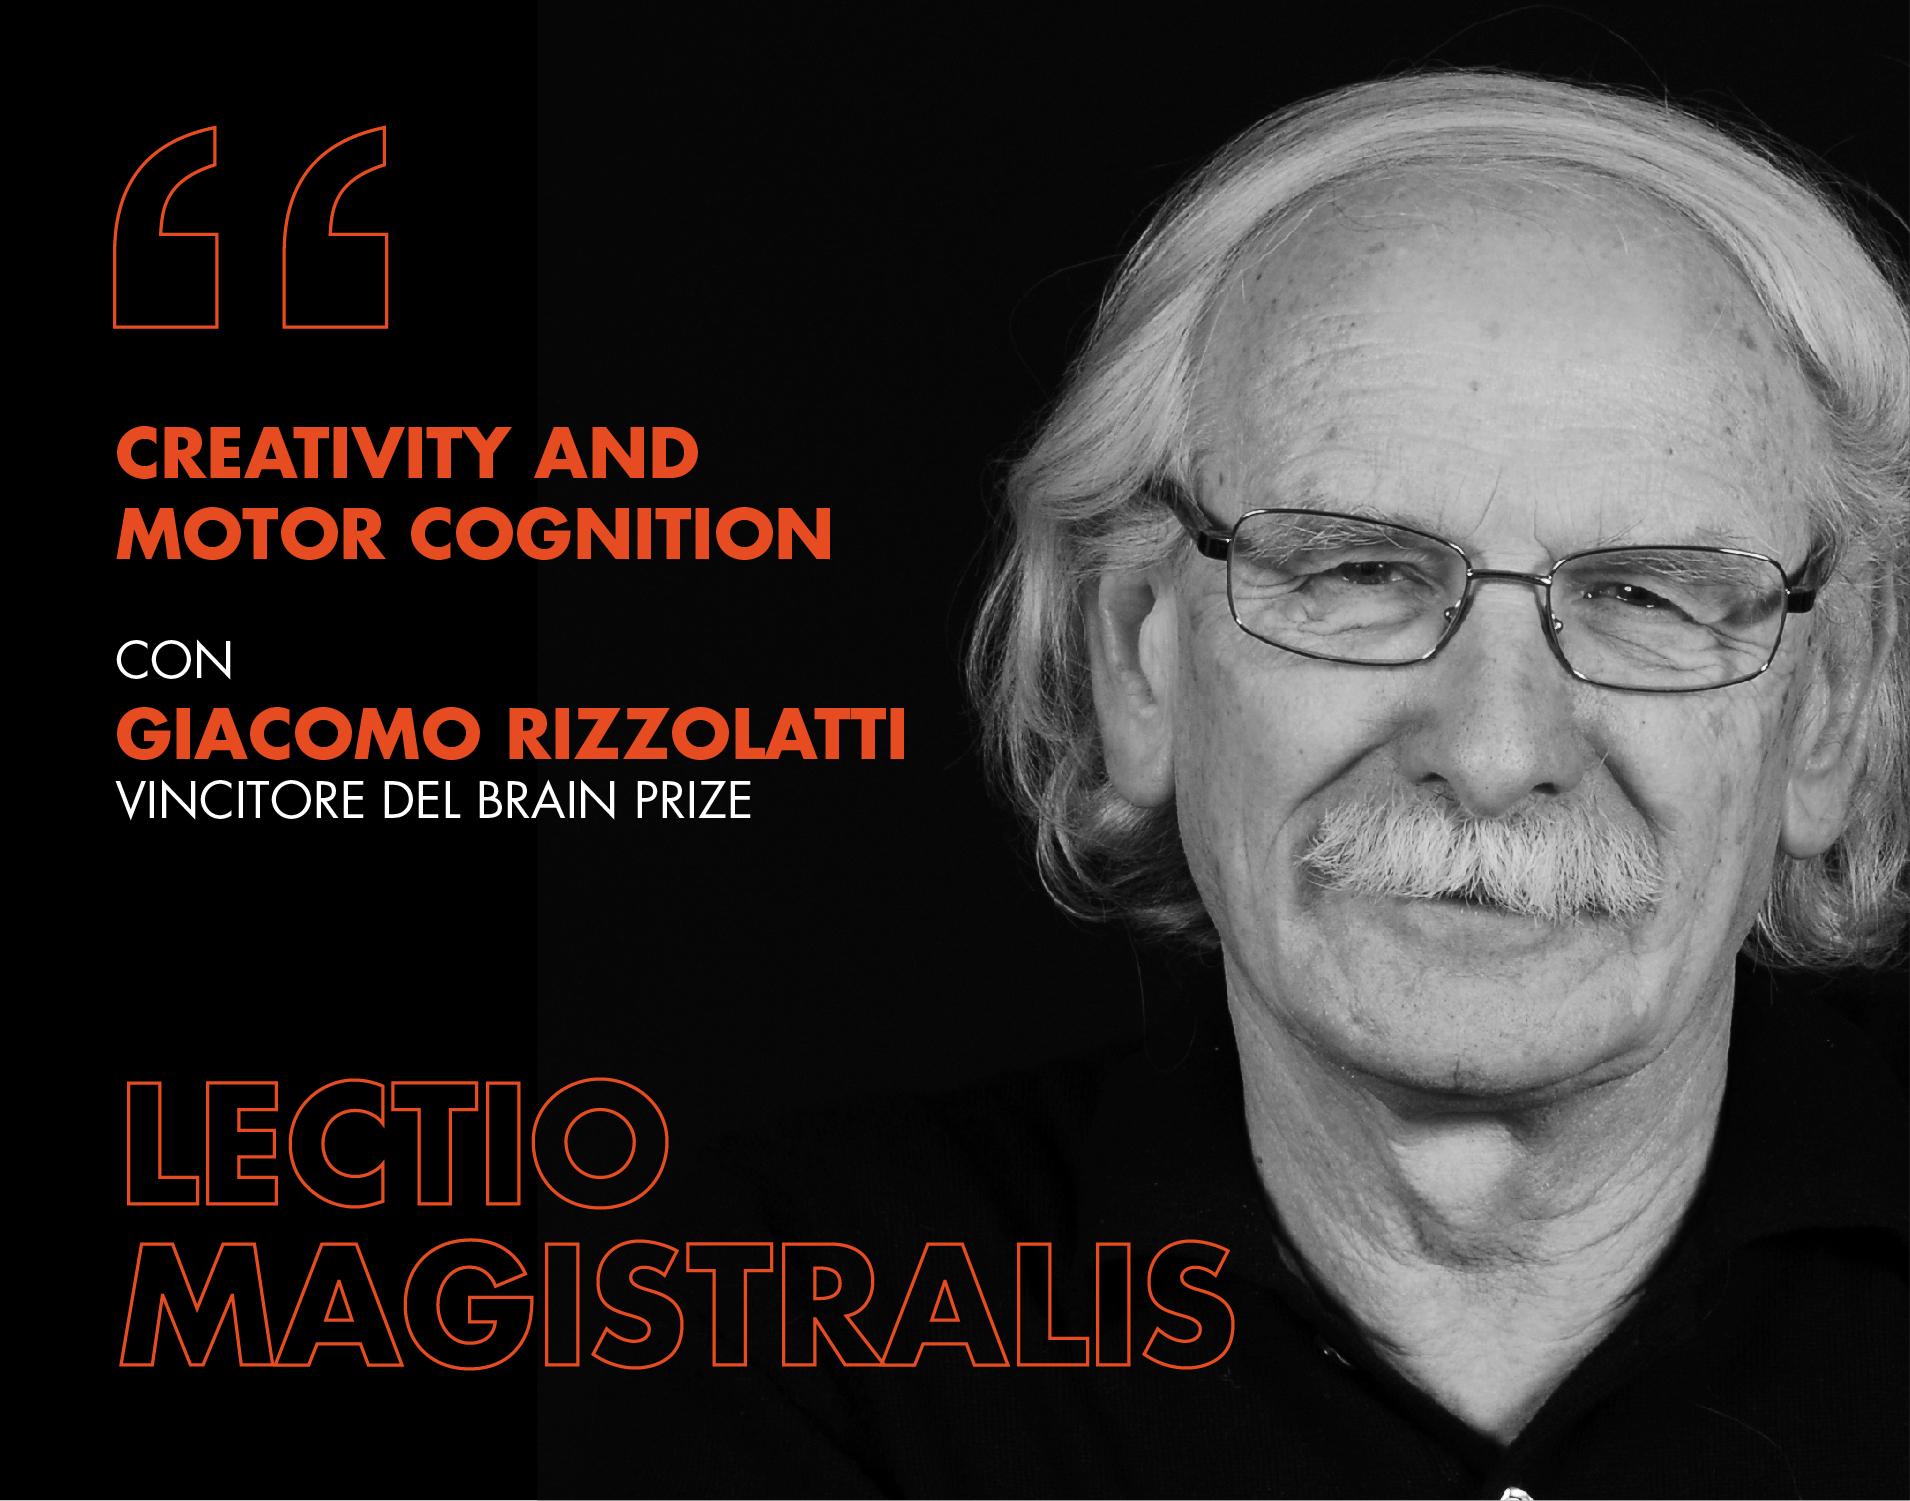 Creativity and Motor Cognition - Lectio Magistralis Rizzolati